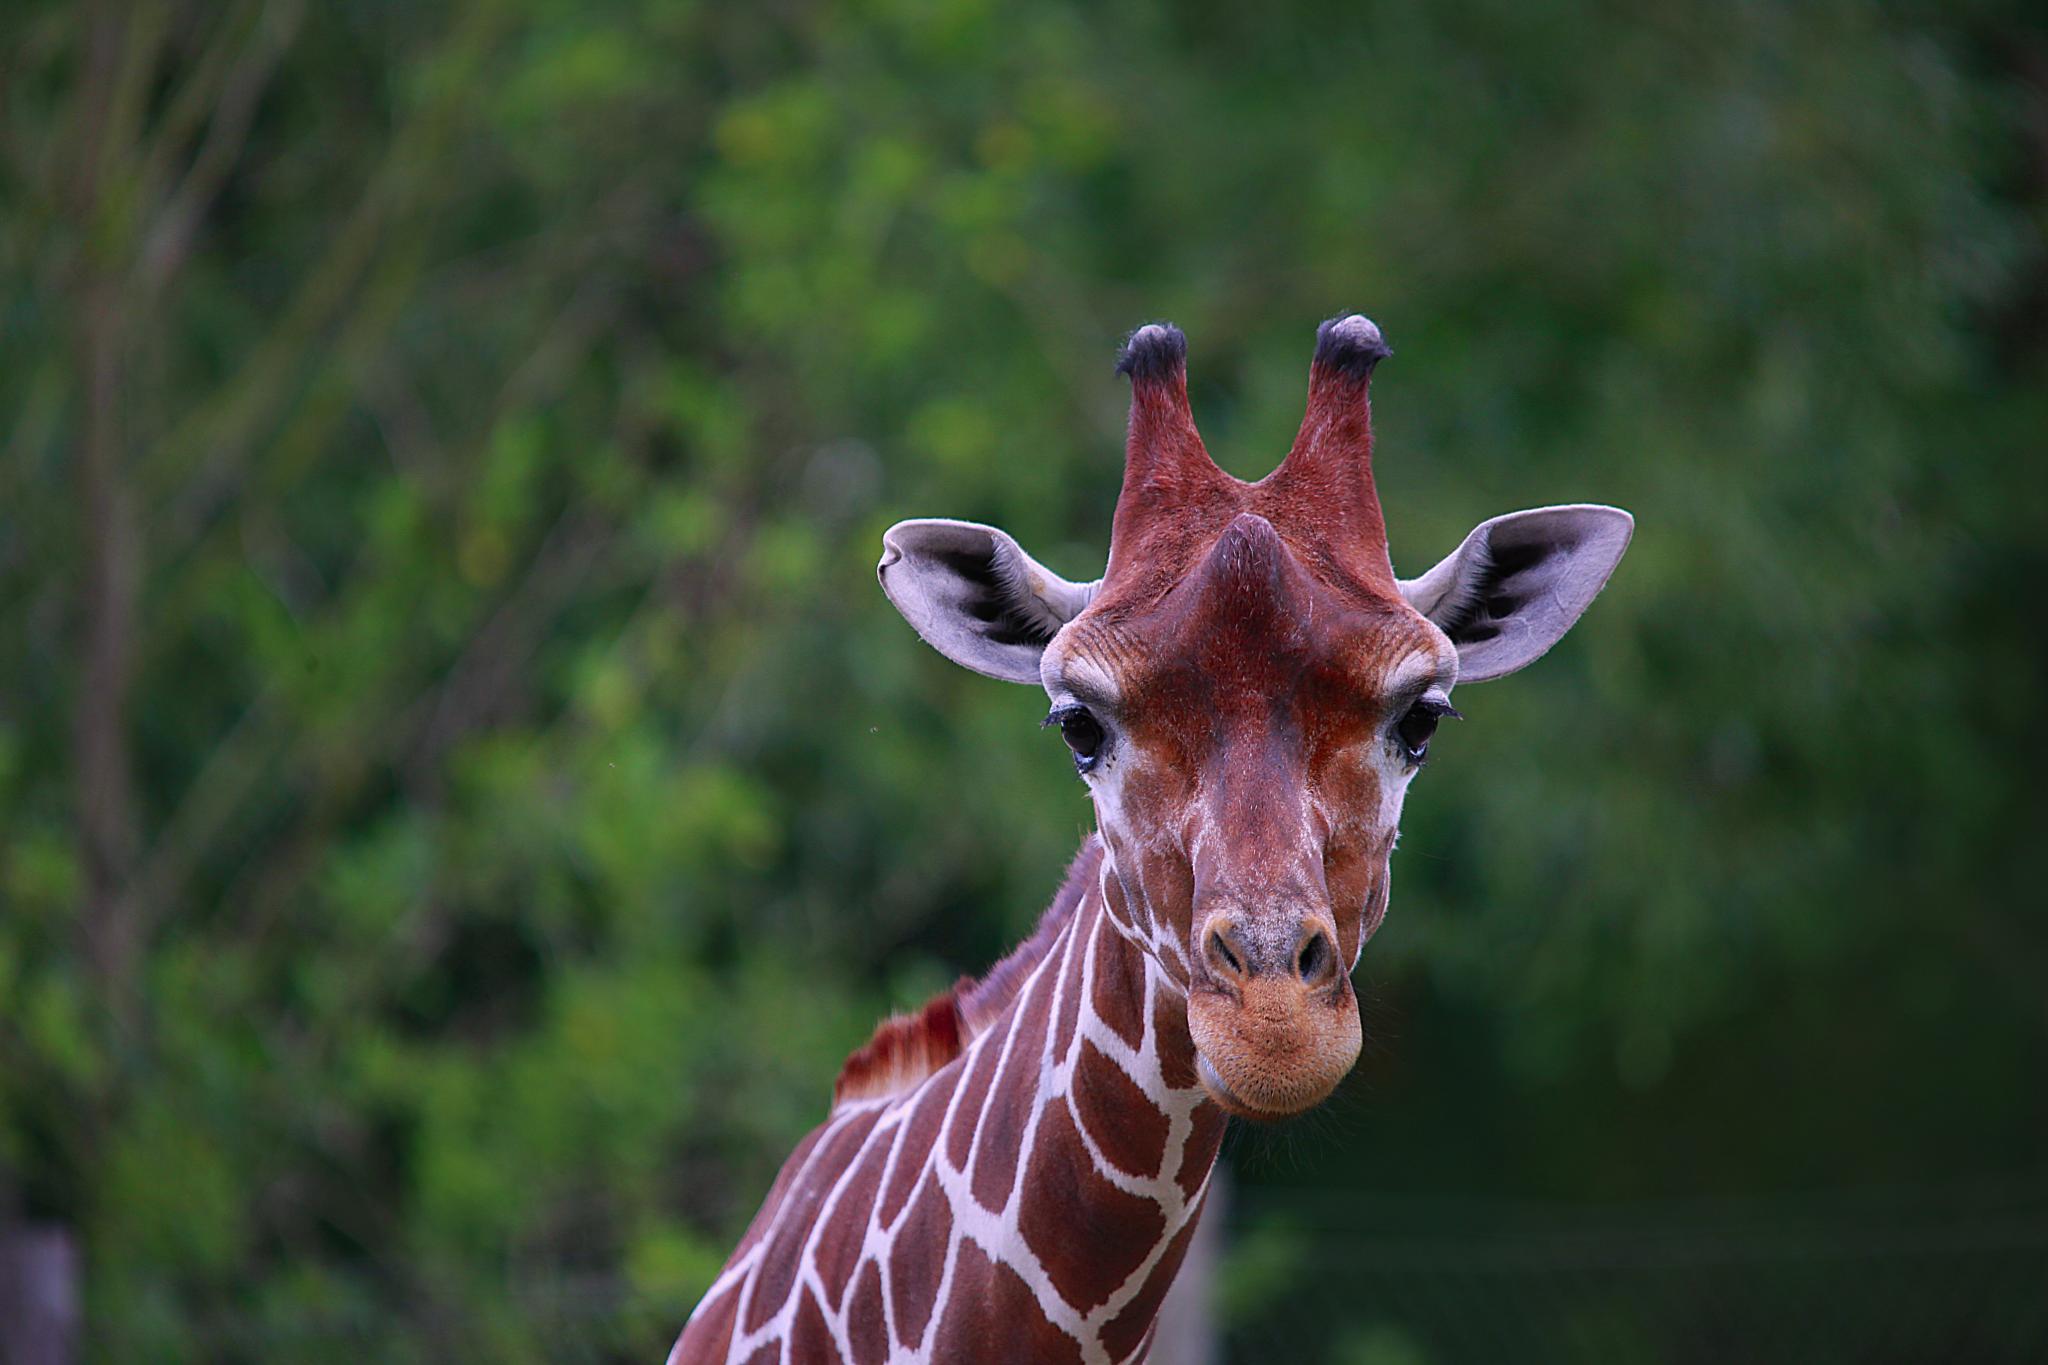 Giraffe portrait by Sonny Kraack